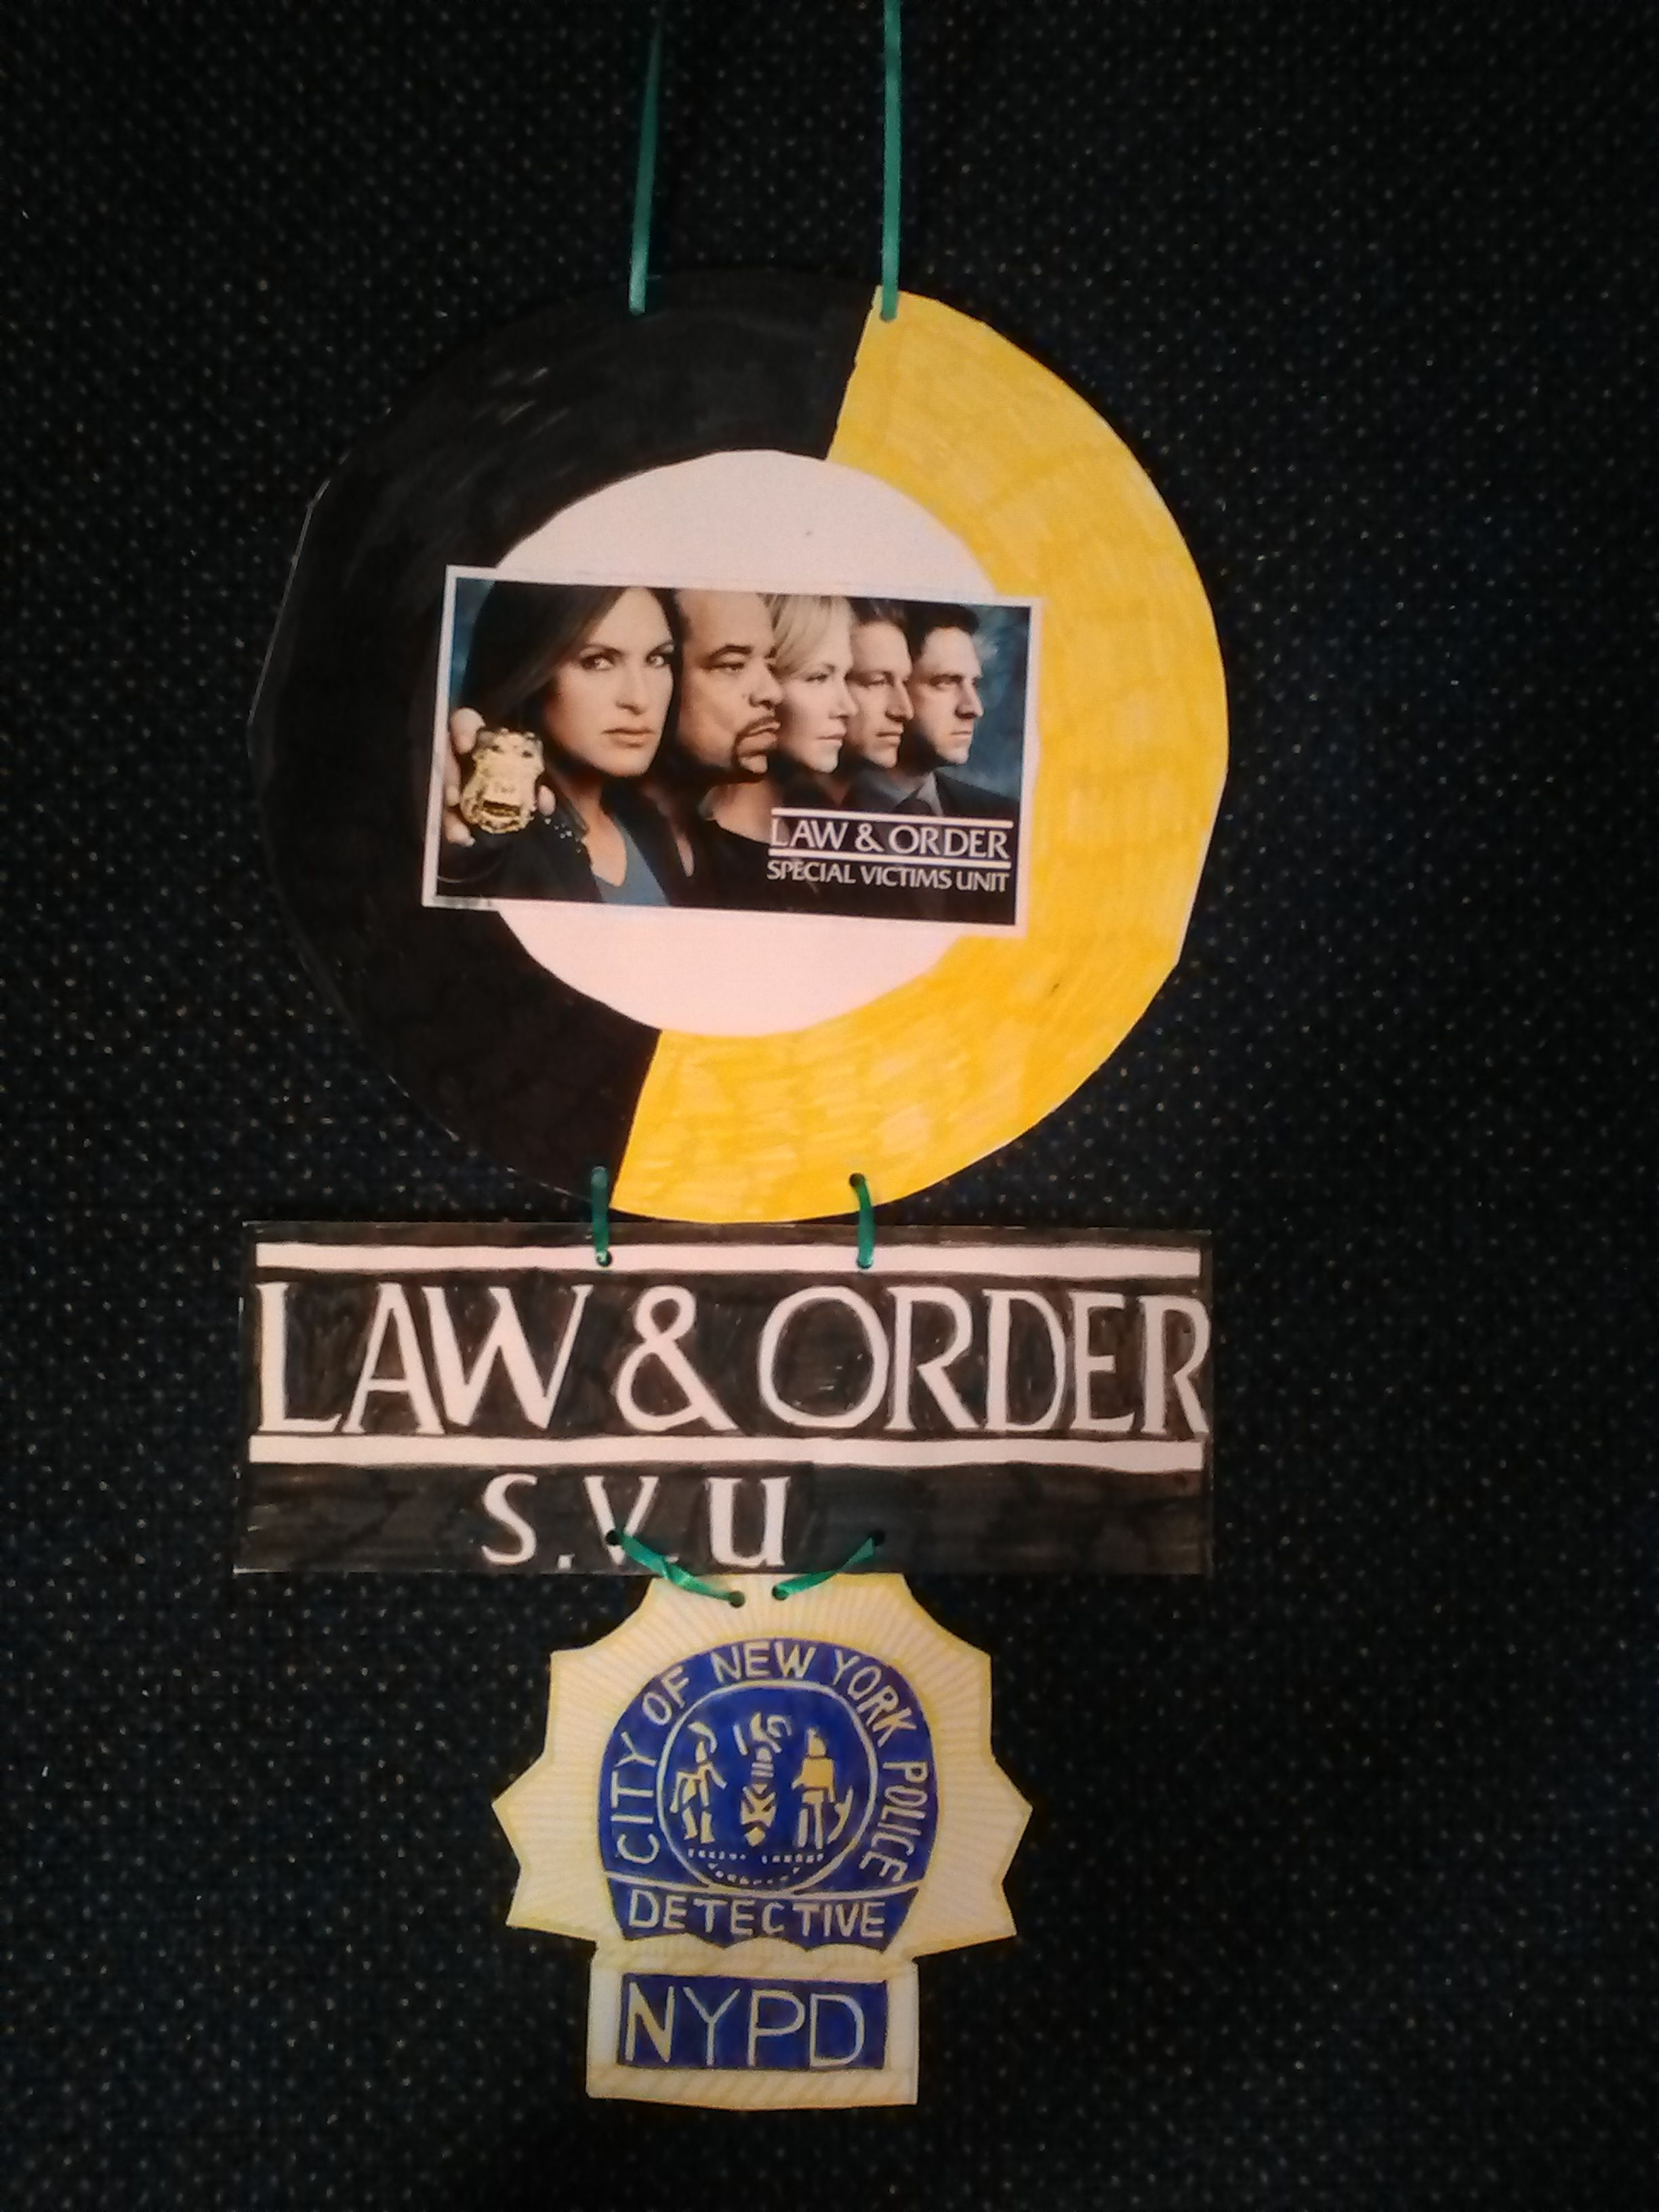 Law /& Order Special Victims Unit TEAM Photo Licensed Adult Sweatshirt Hoodie